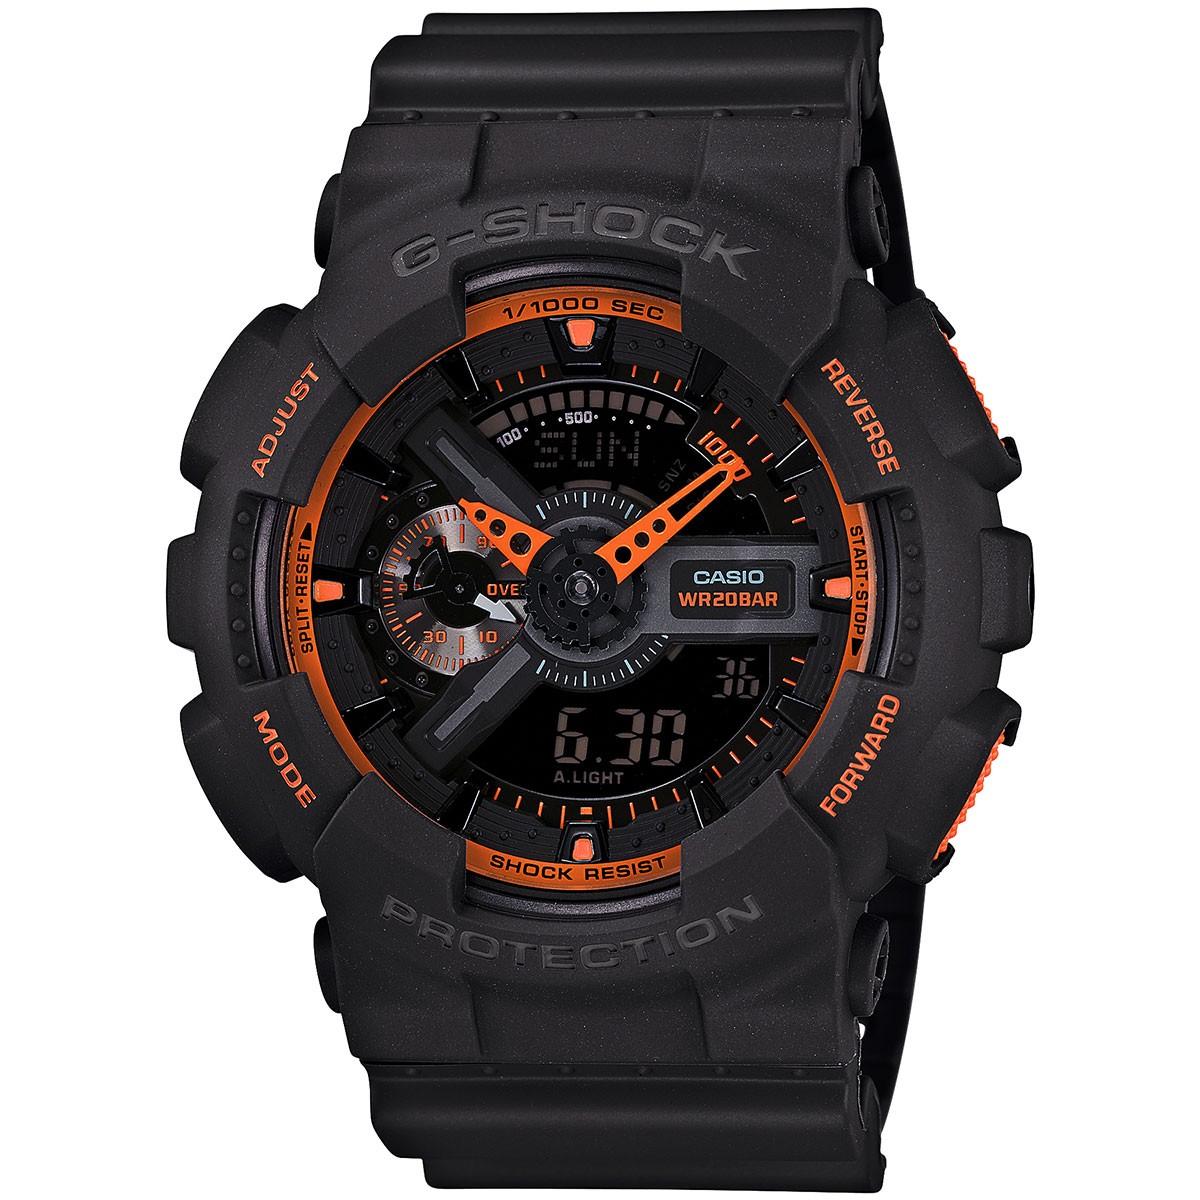 Casio G-Shock Chronograaf Gemiddelde snelheid GA-110TS-1A4ER